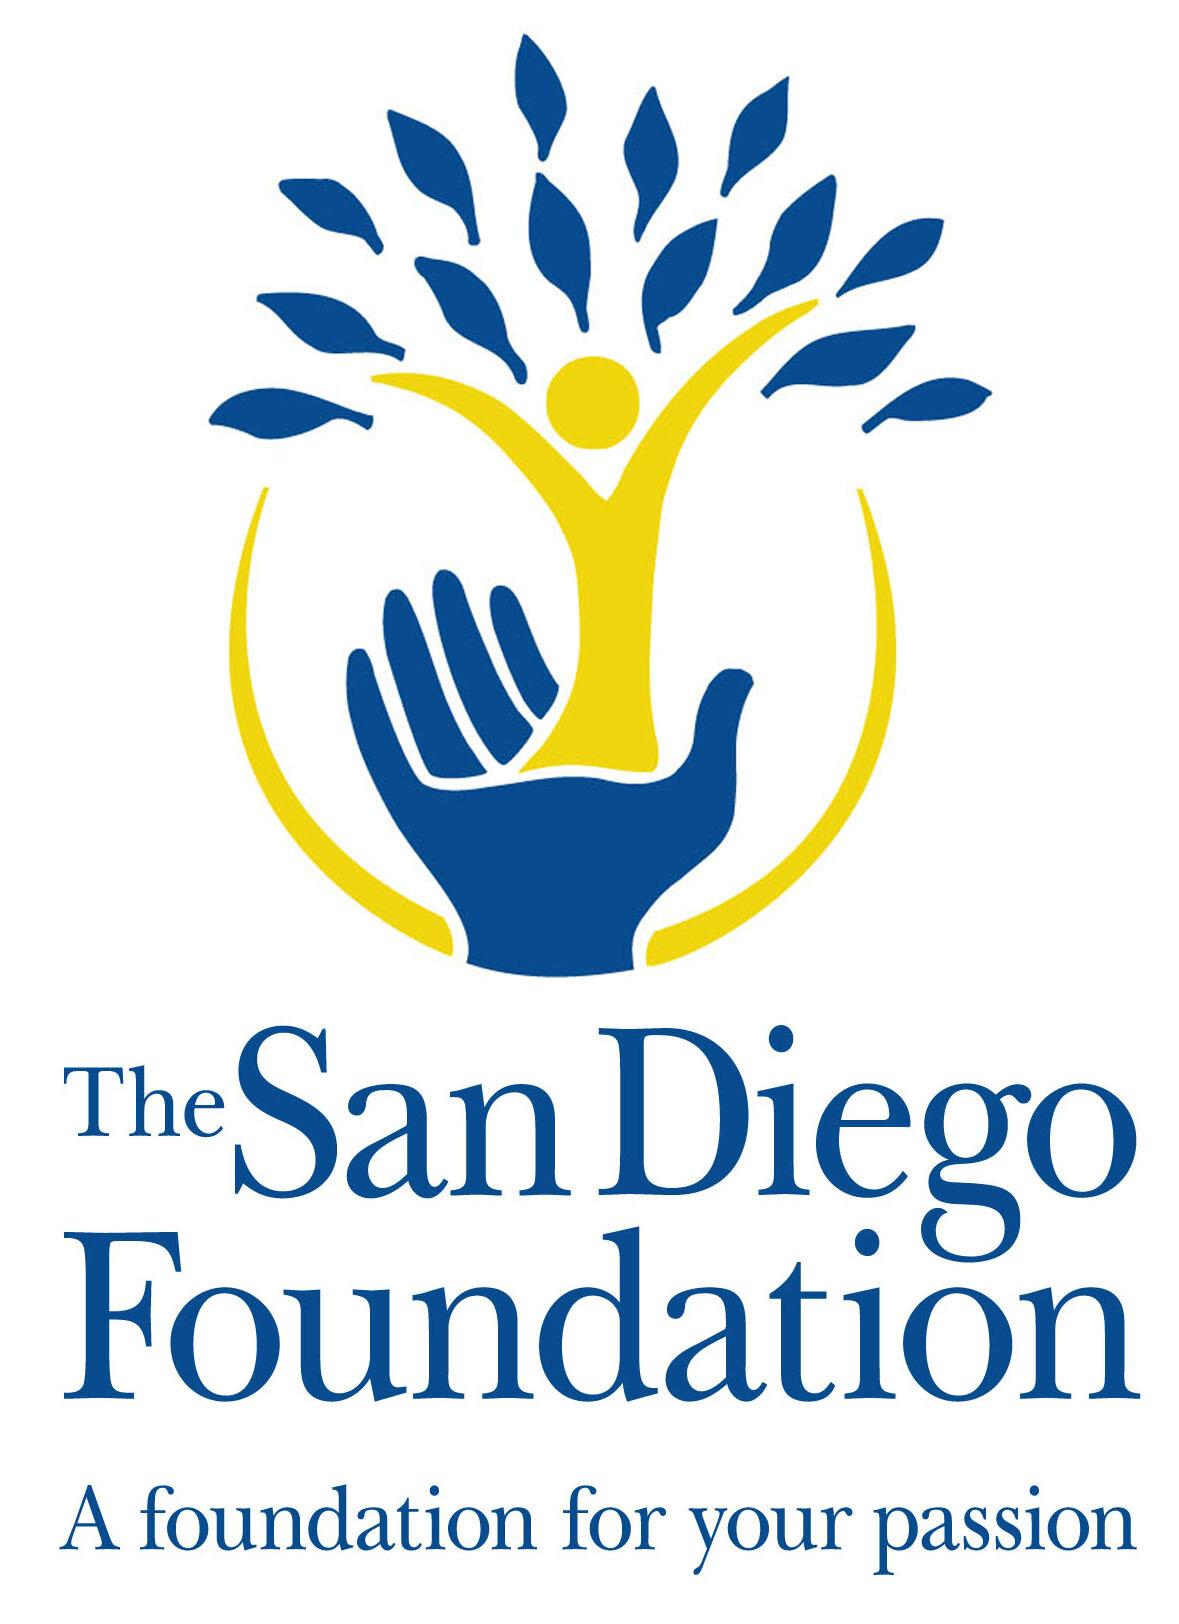 San Diego Foundation vertical.jpg